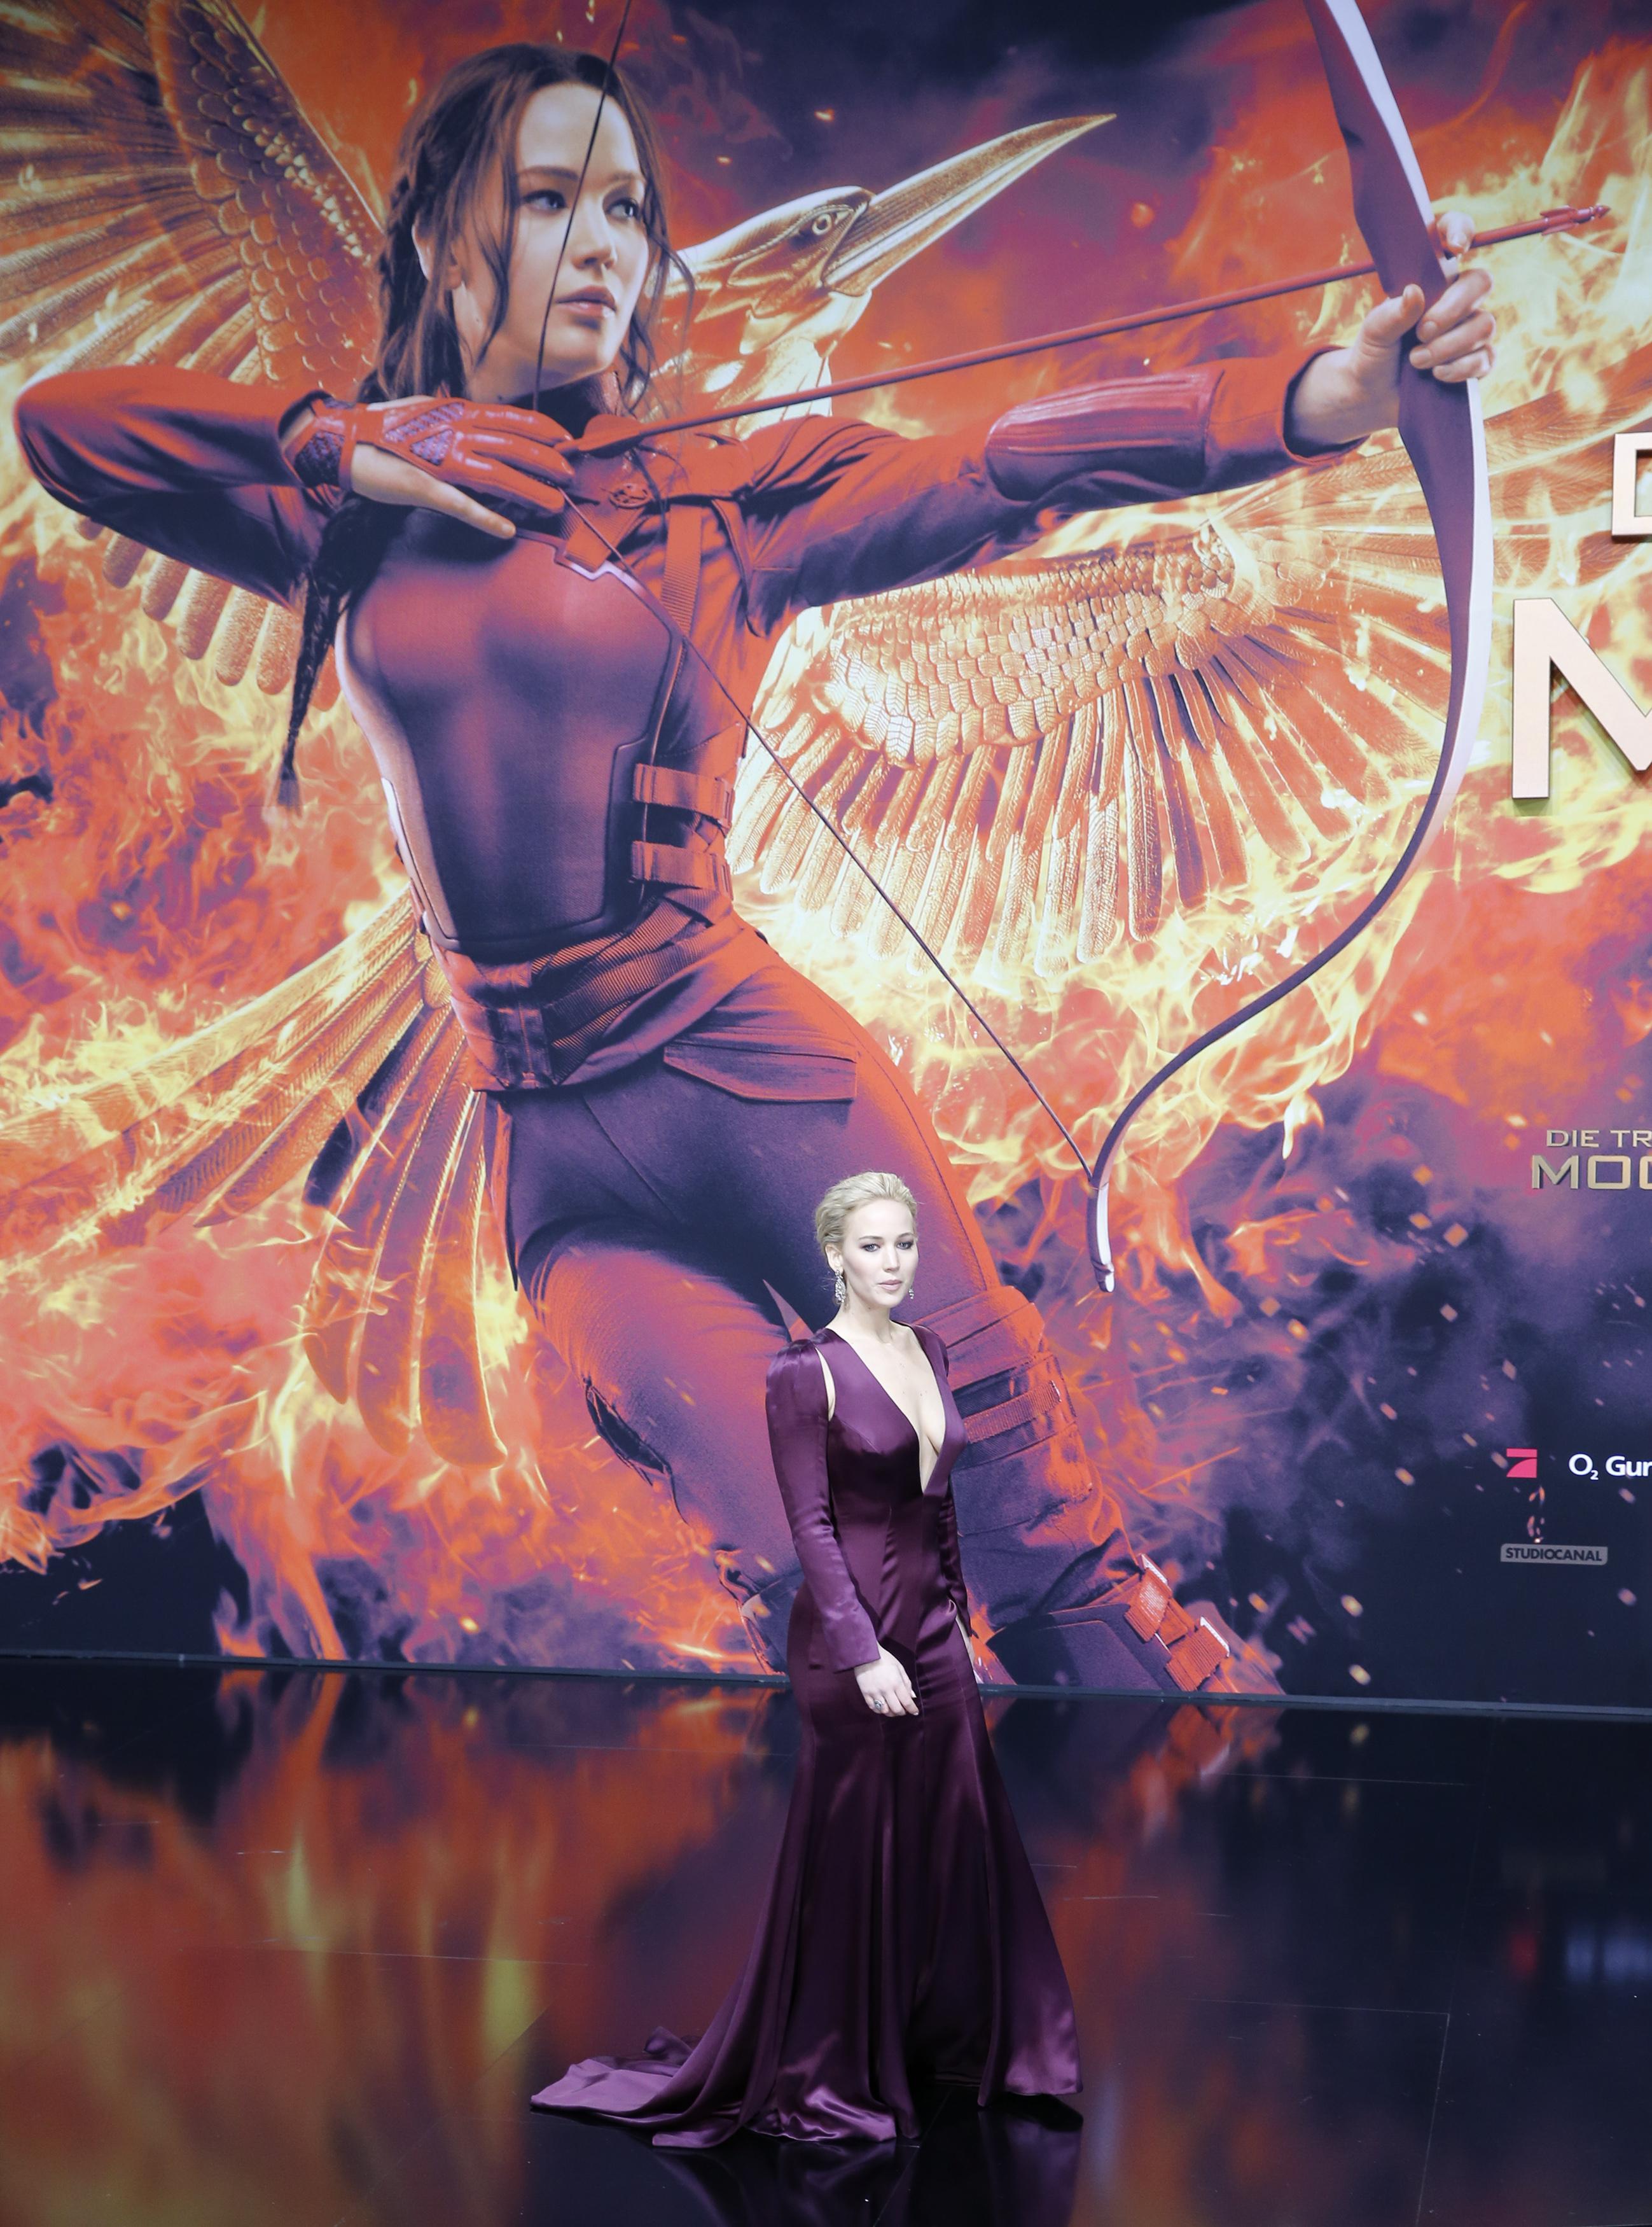 Cast member Jennifer Lawrence poses as she arrives for the world premiere of  The Hunger Games: Mockingjay - Part 2  in Berlin on Nov. 4, 2015.